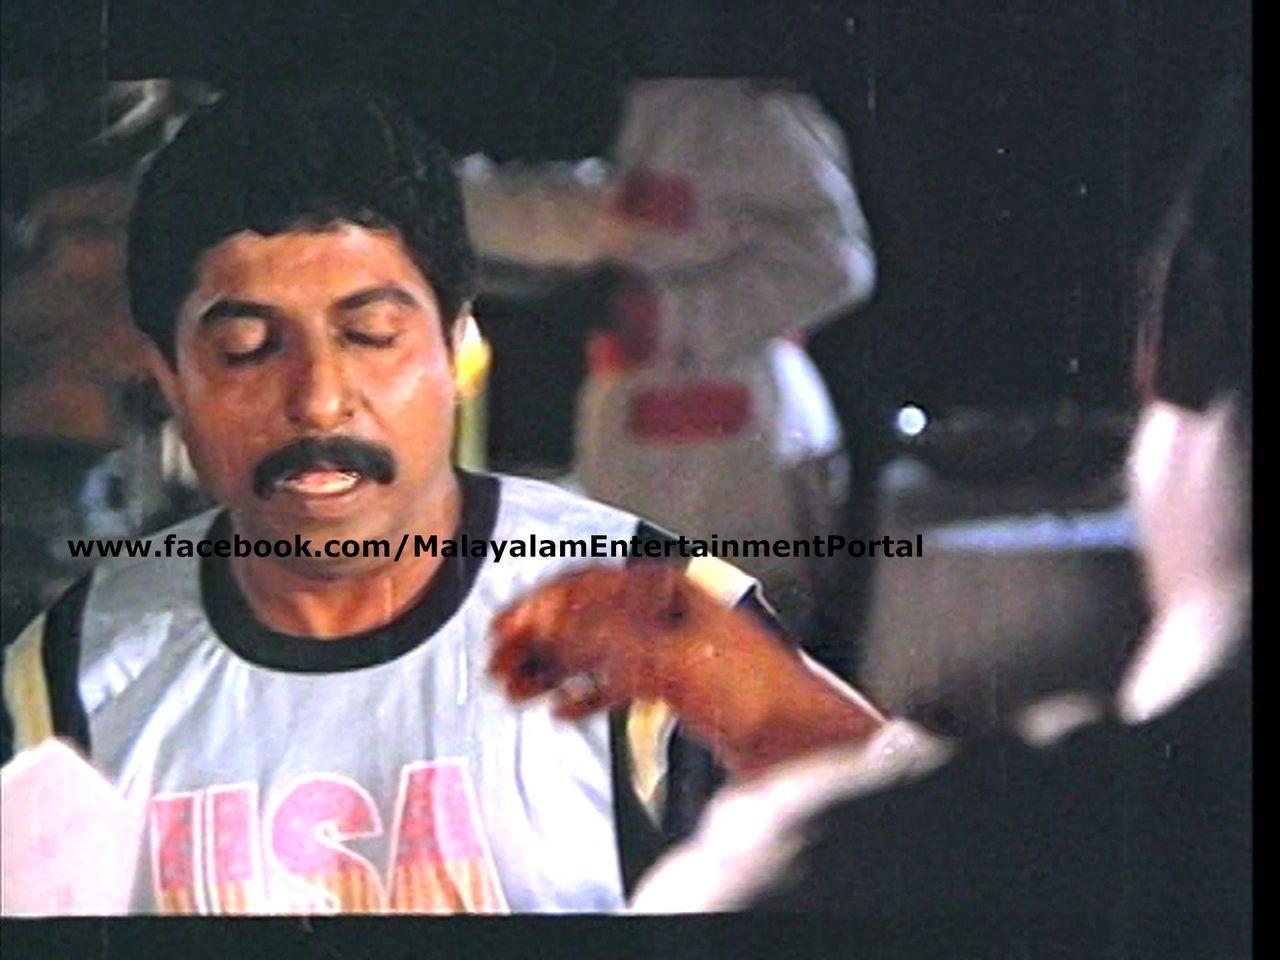 Mukundetta Sumithra Vilikyunnu Saina DVD Screenshots Bscap0011